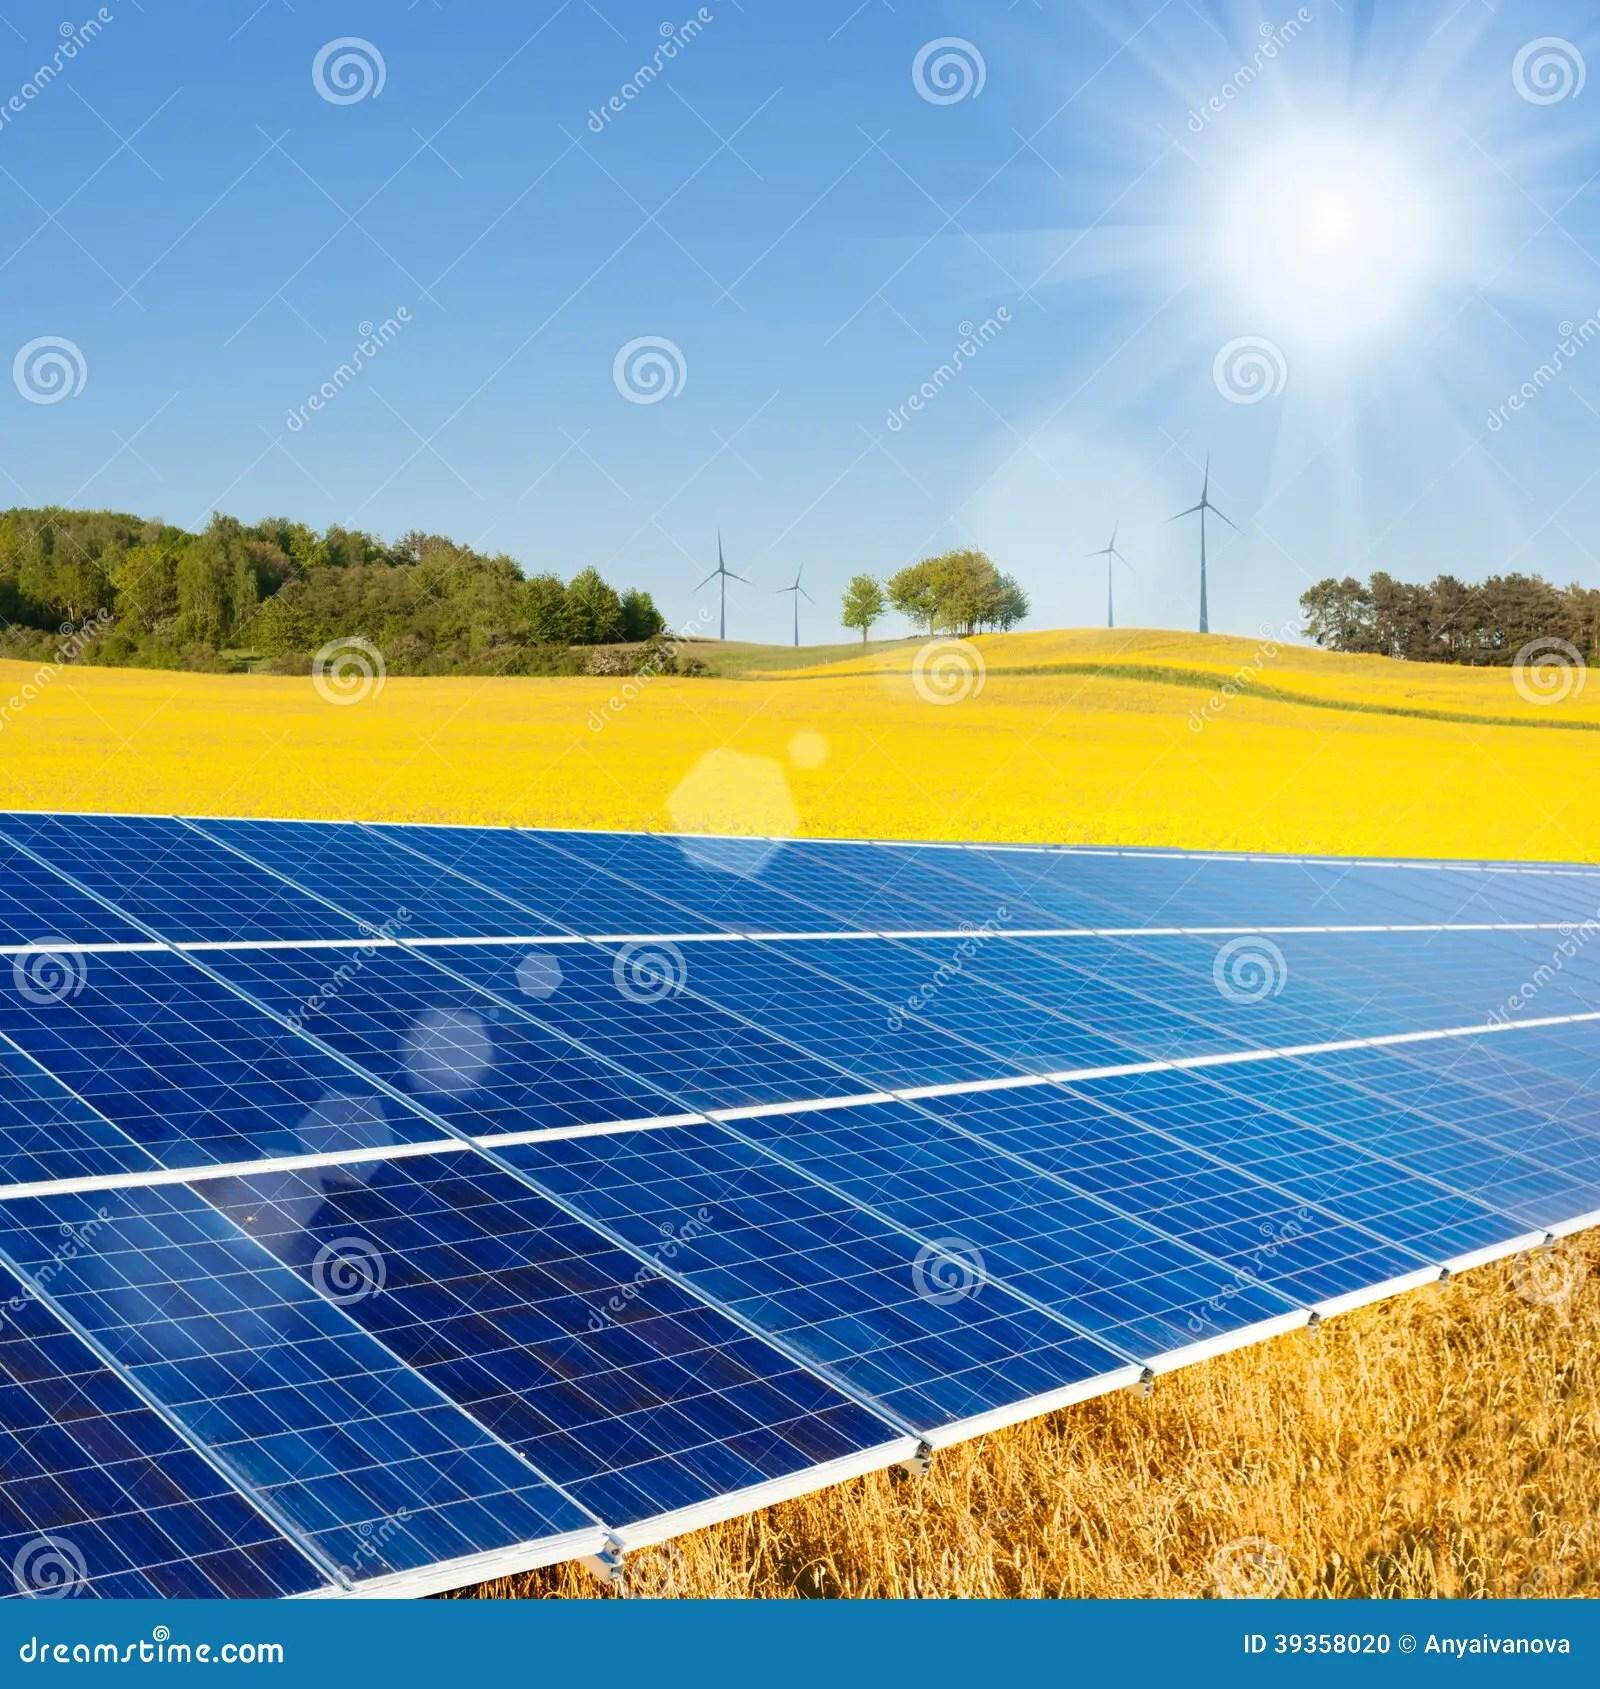 Alternative Energy Sources Stock Photo Image Of Farm